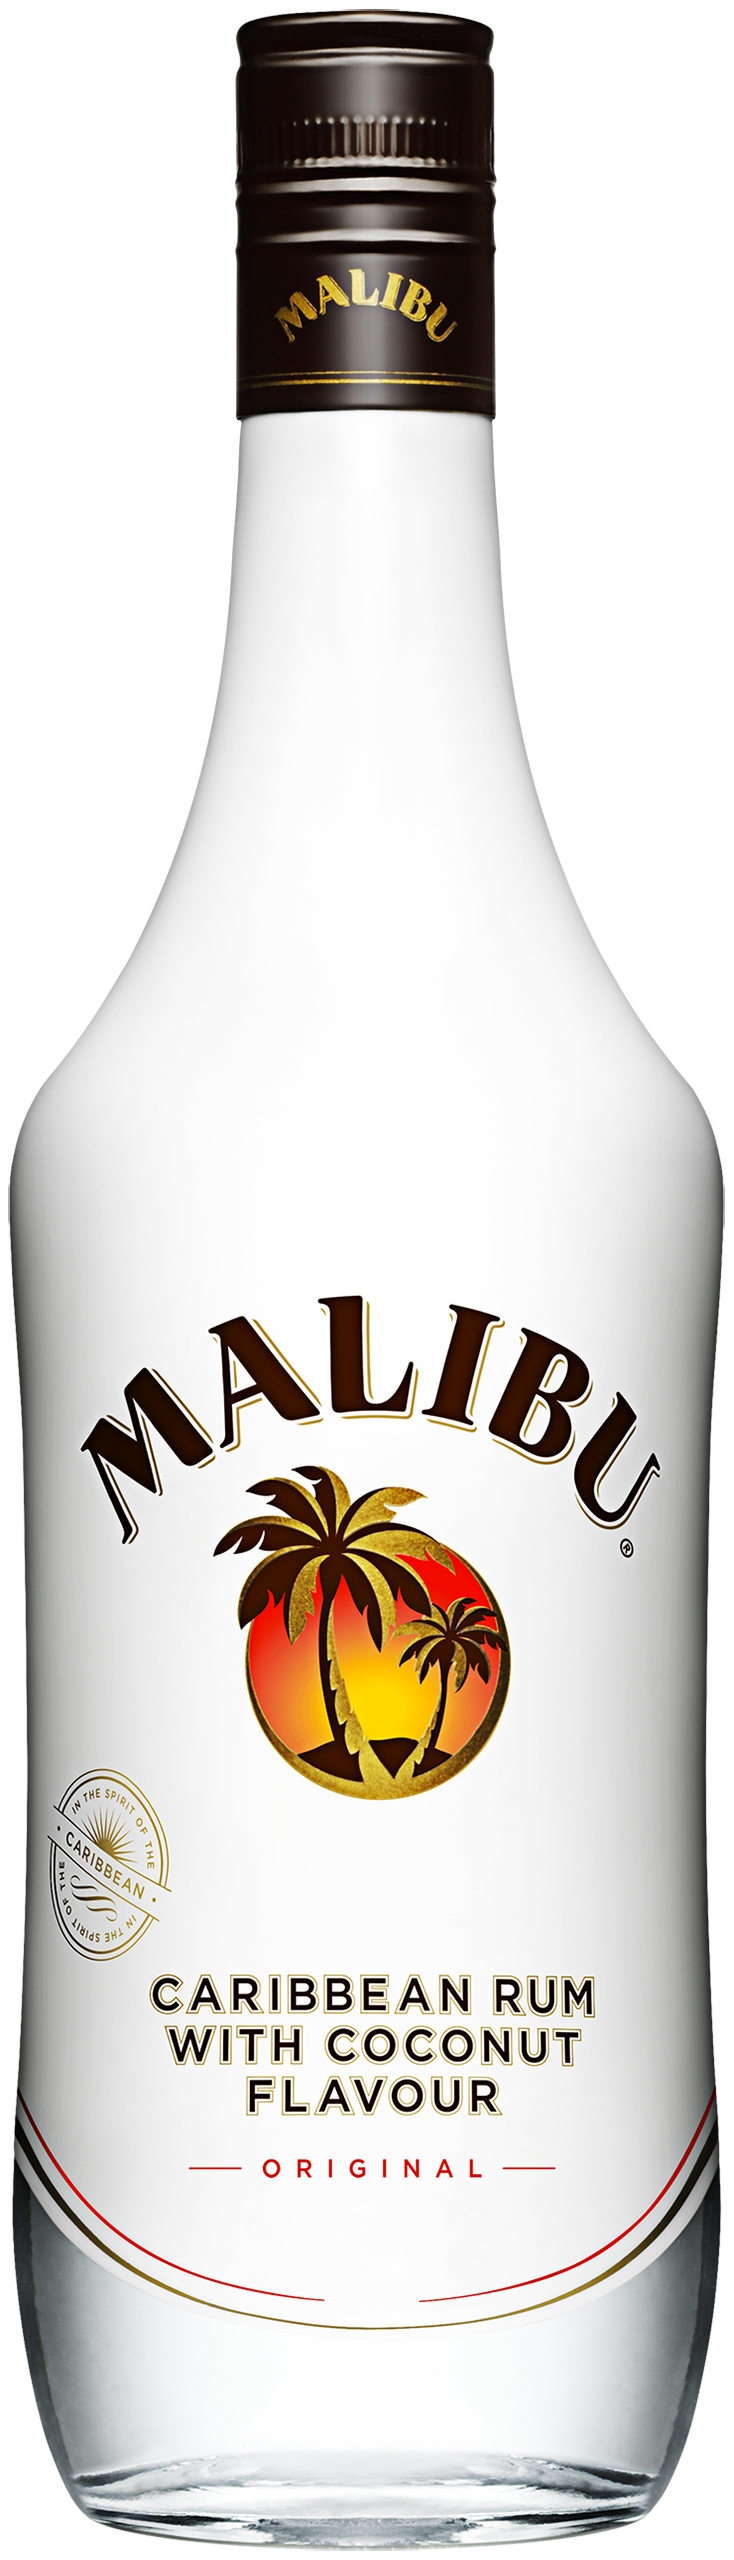 Drinking clipart rum. Malibu pernod ricard packshot